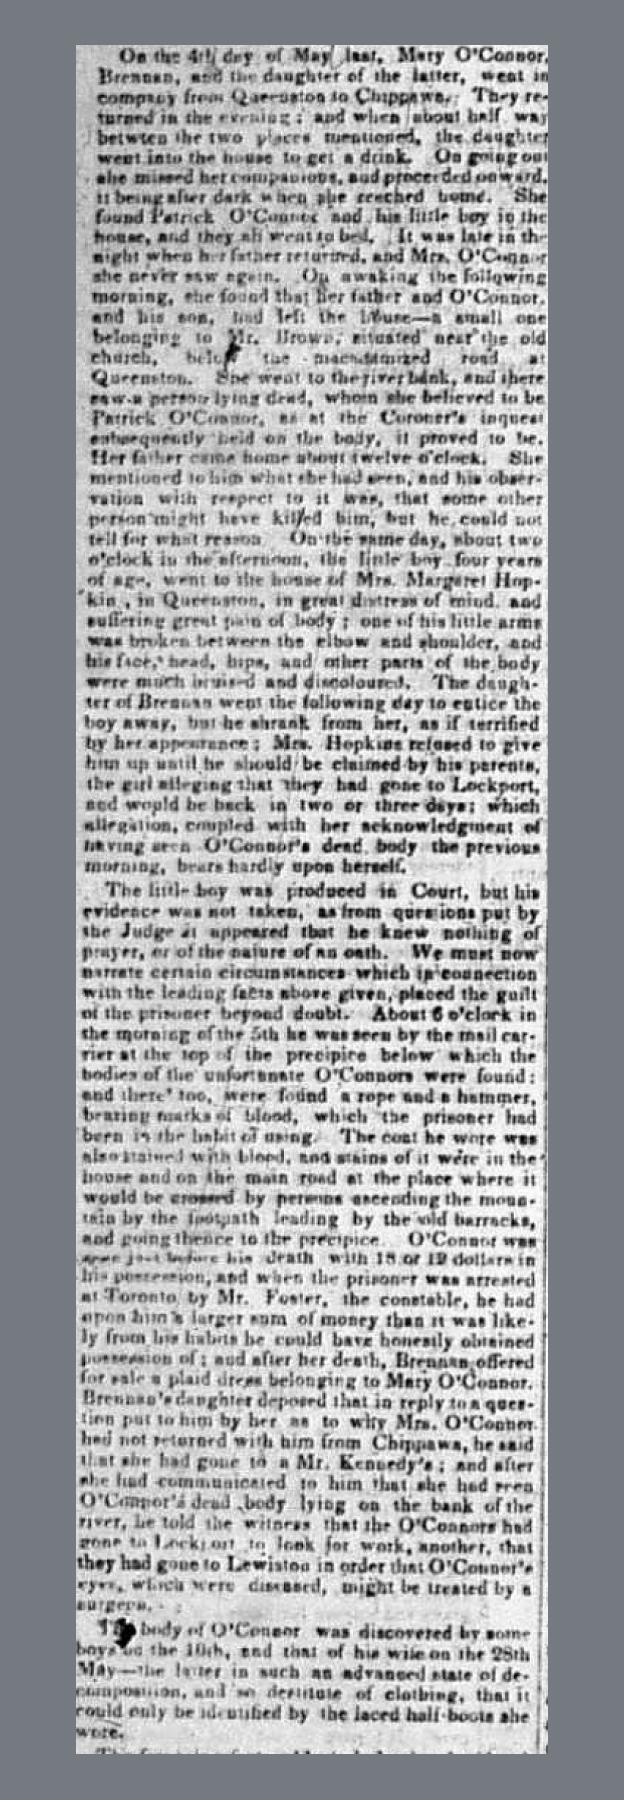 Newspaper Clipping - Murder Trial of Thomas Brennan, Globe, 27 September, 1848